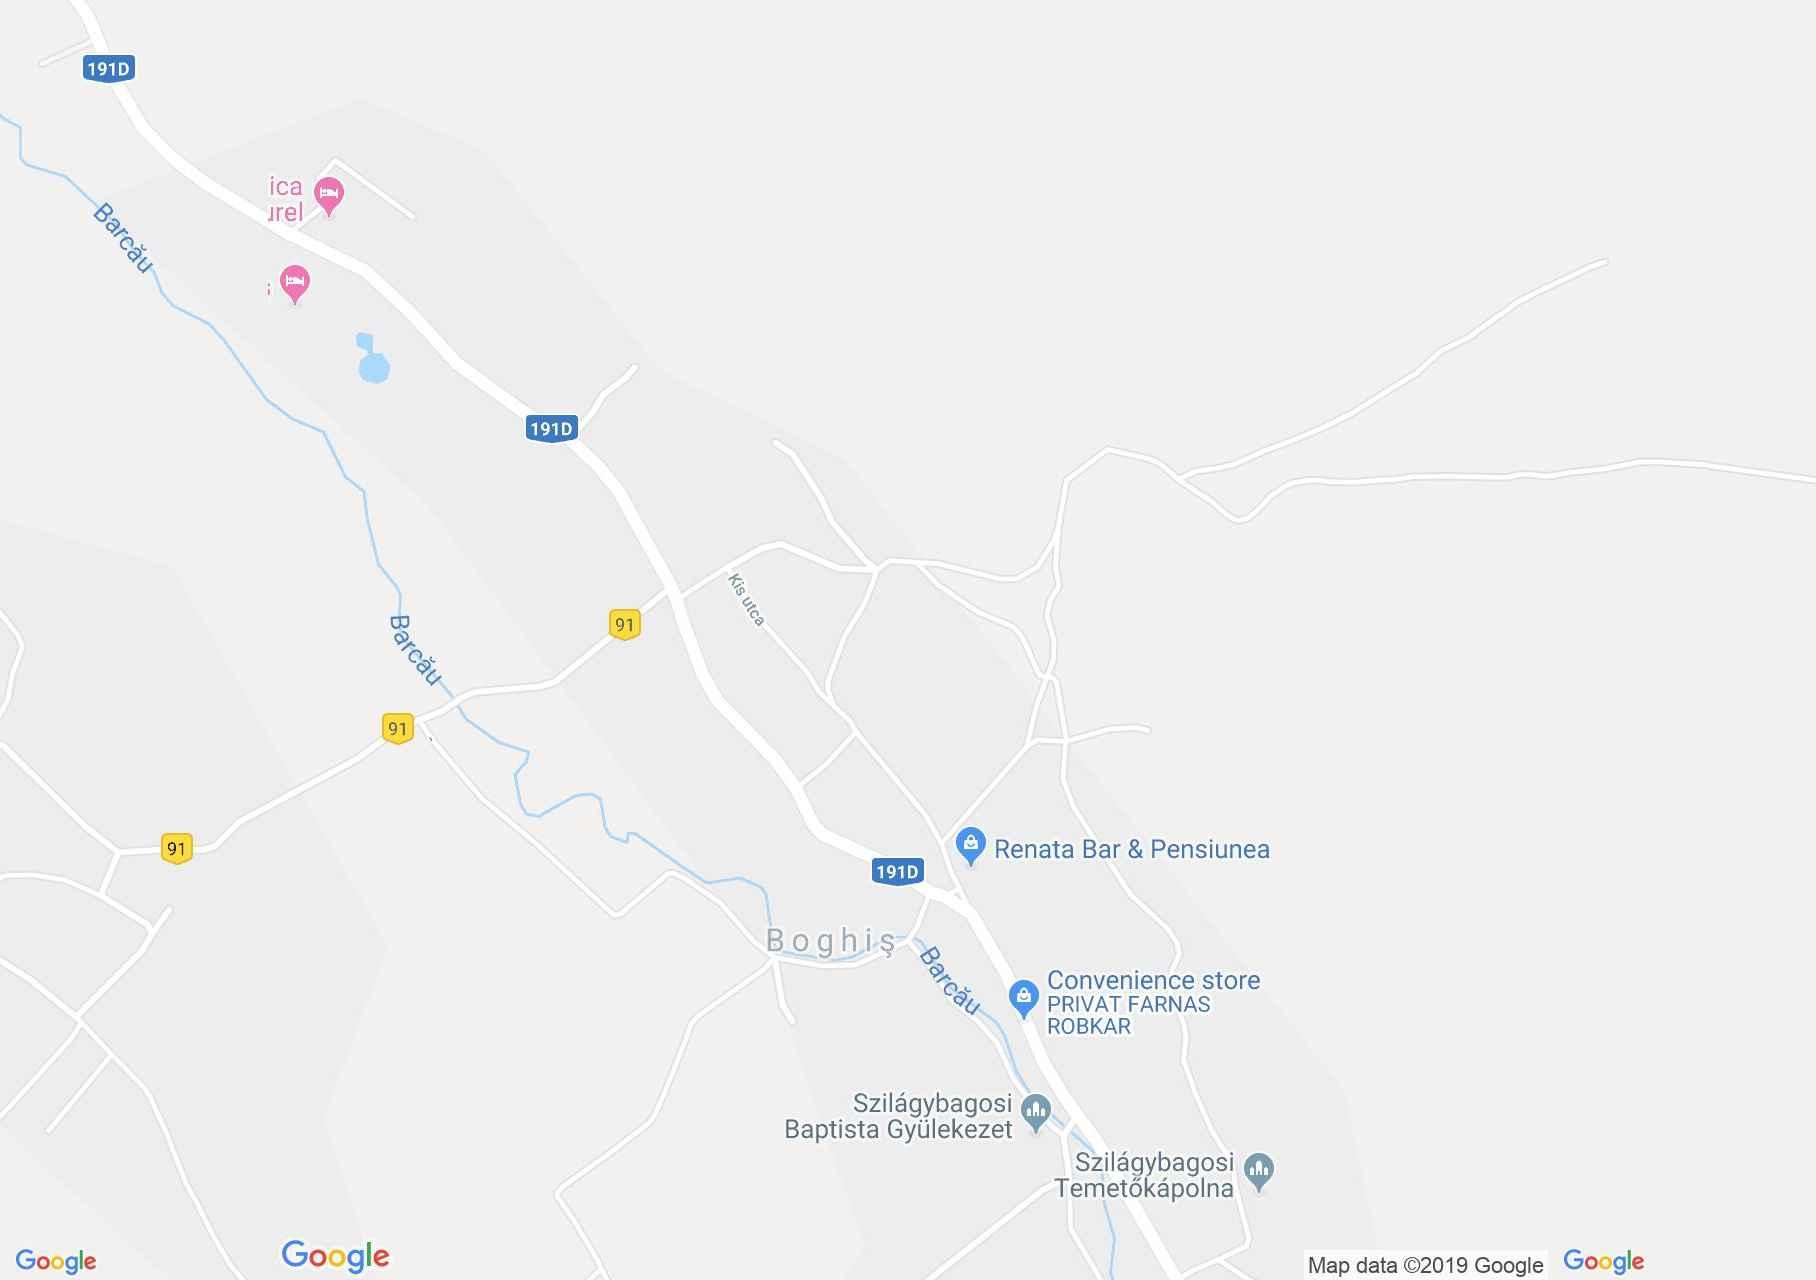 Map of Boghiş